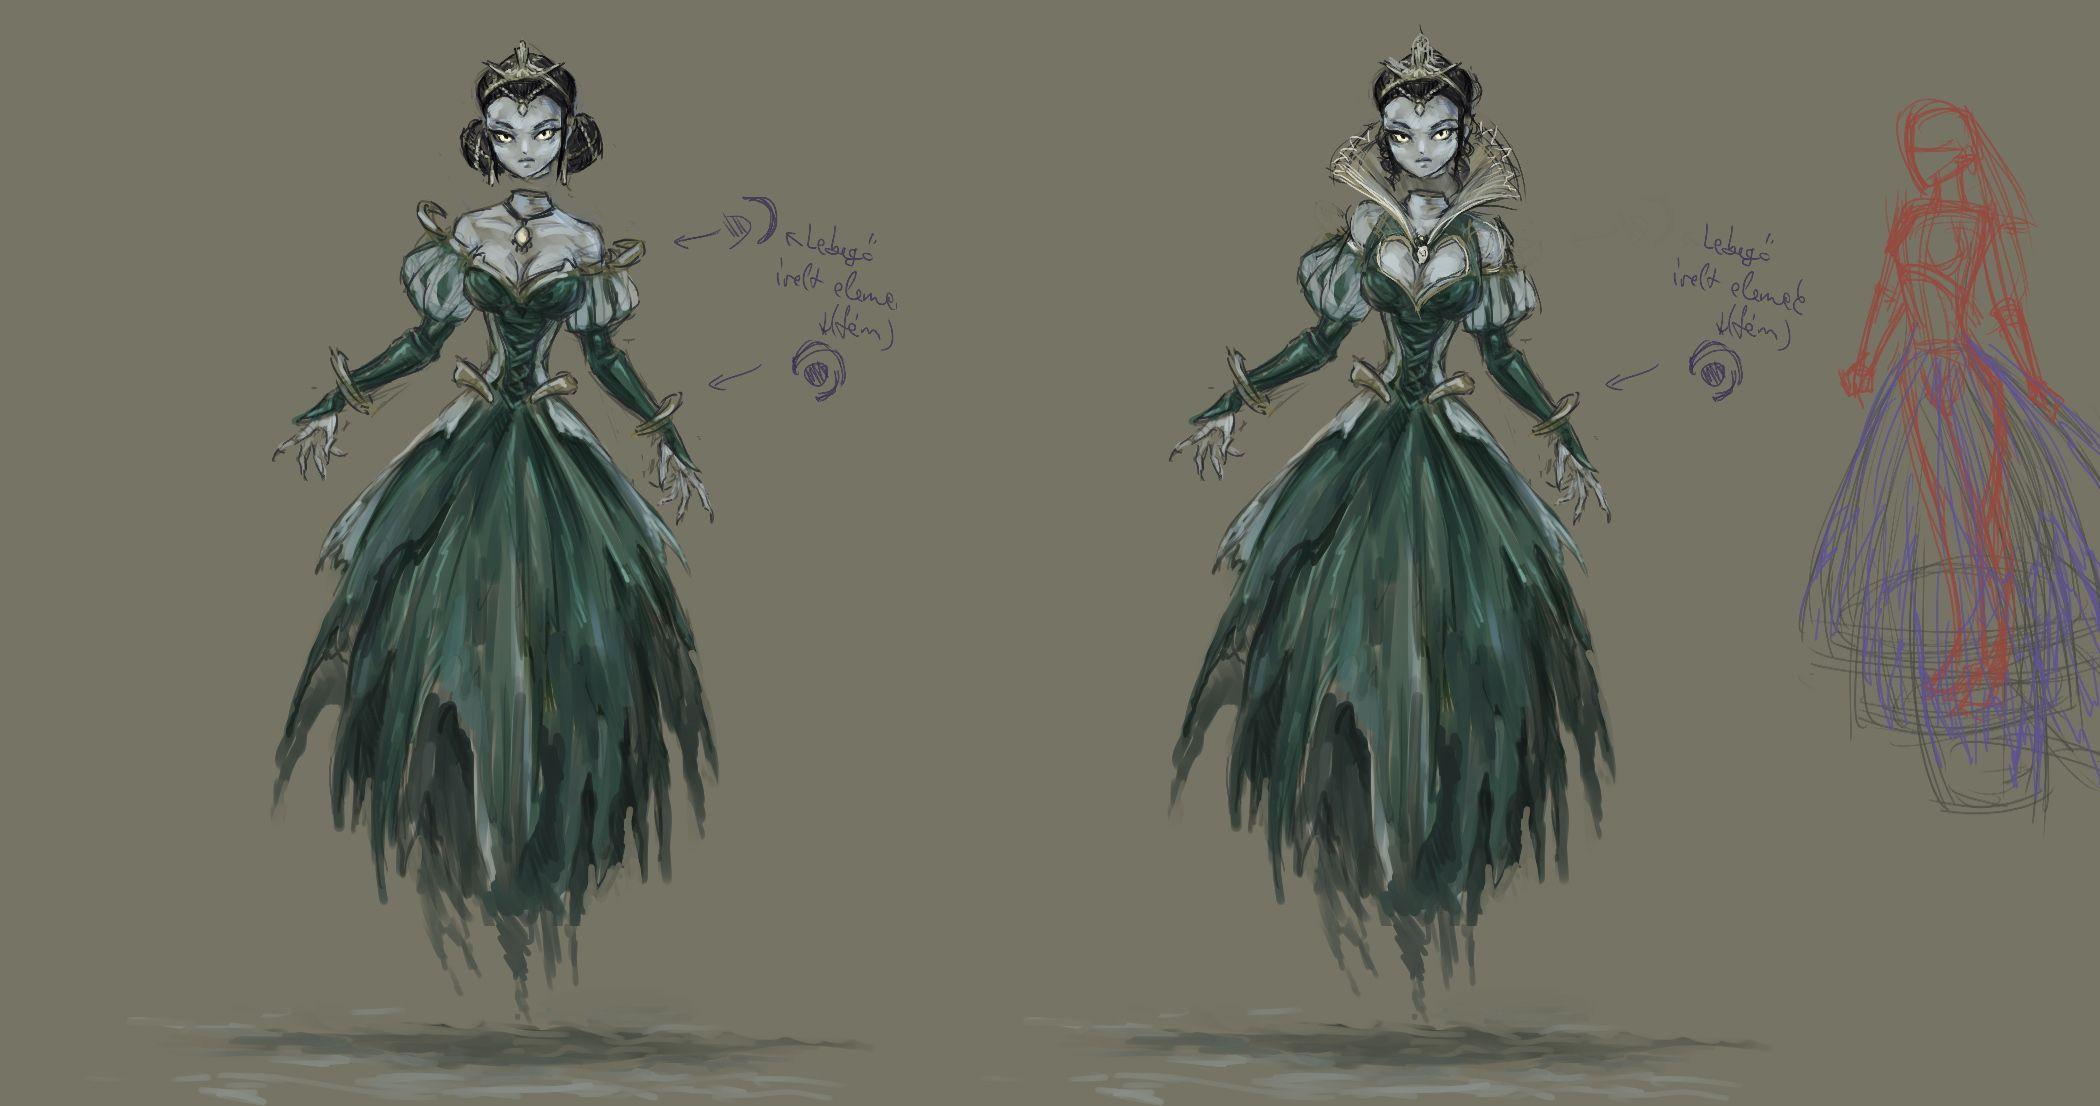 Lady Katarina concept art - The Incredible Adventures of Van Helsing